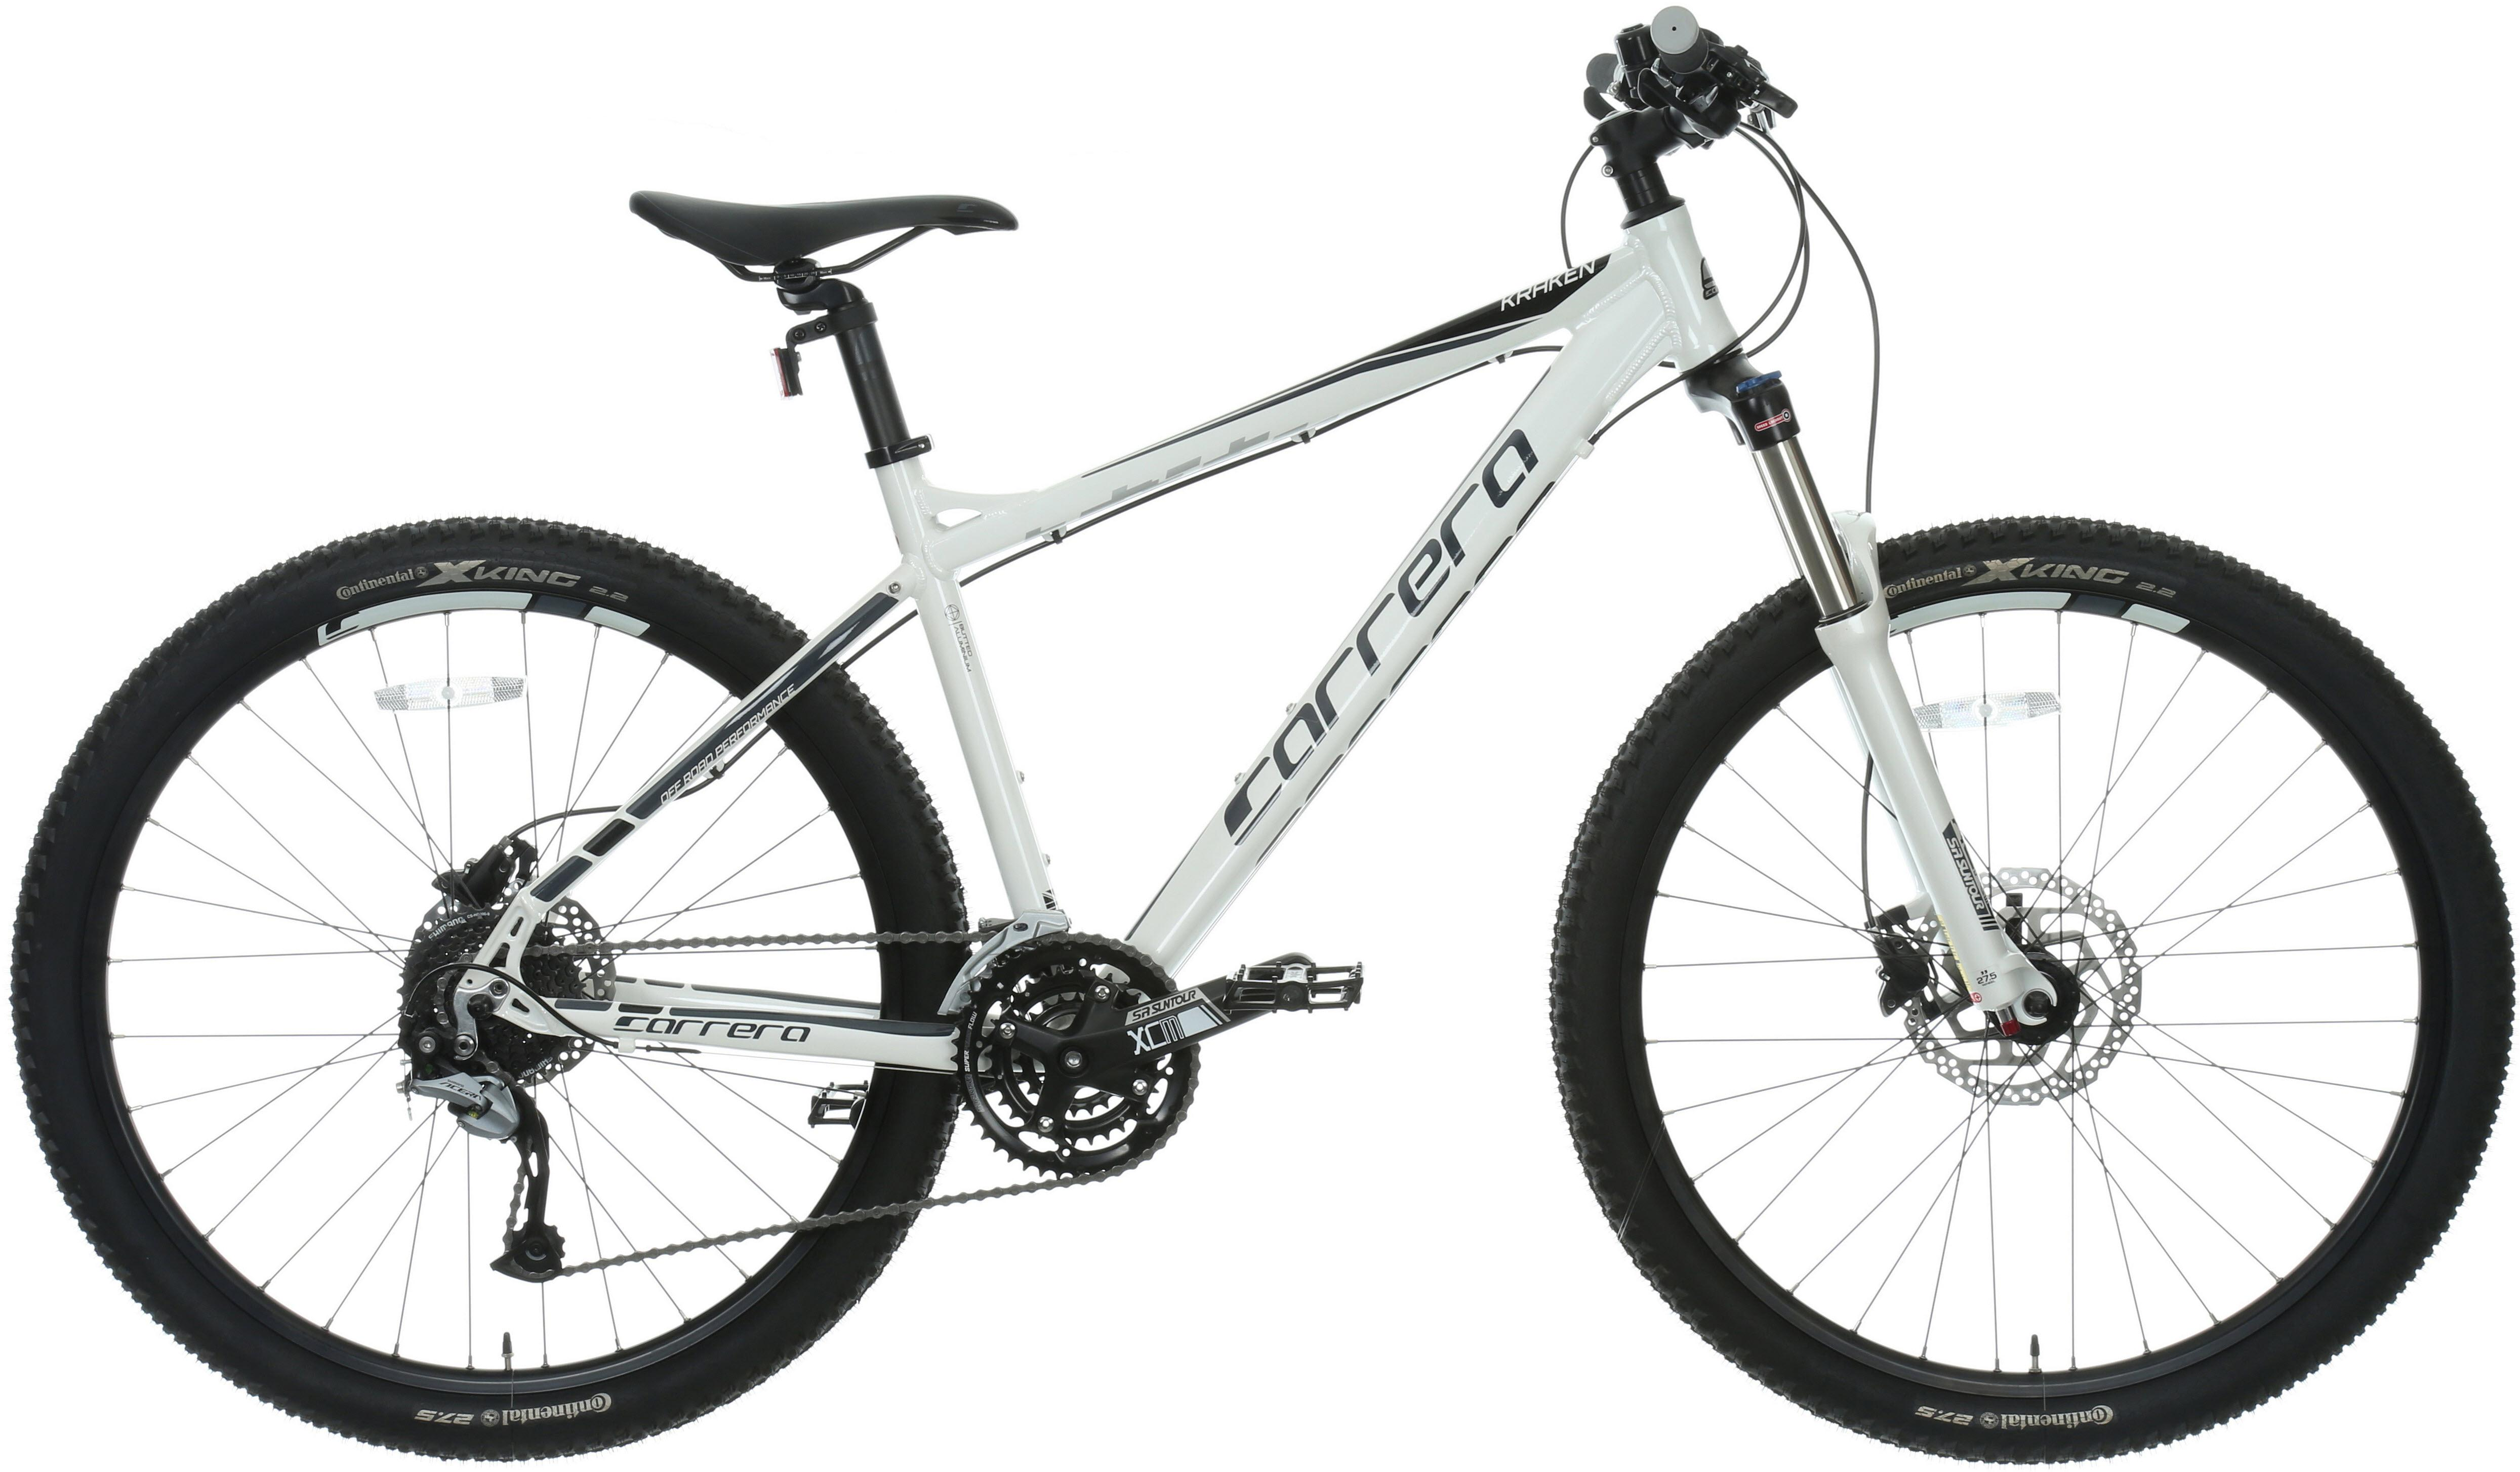 988608564b2 Carrera Kraken Mens Bike MTB Bicycle Alloy Frame 27 Gear 27.5